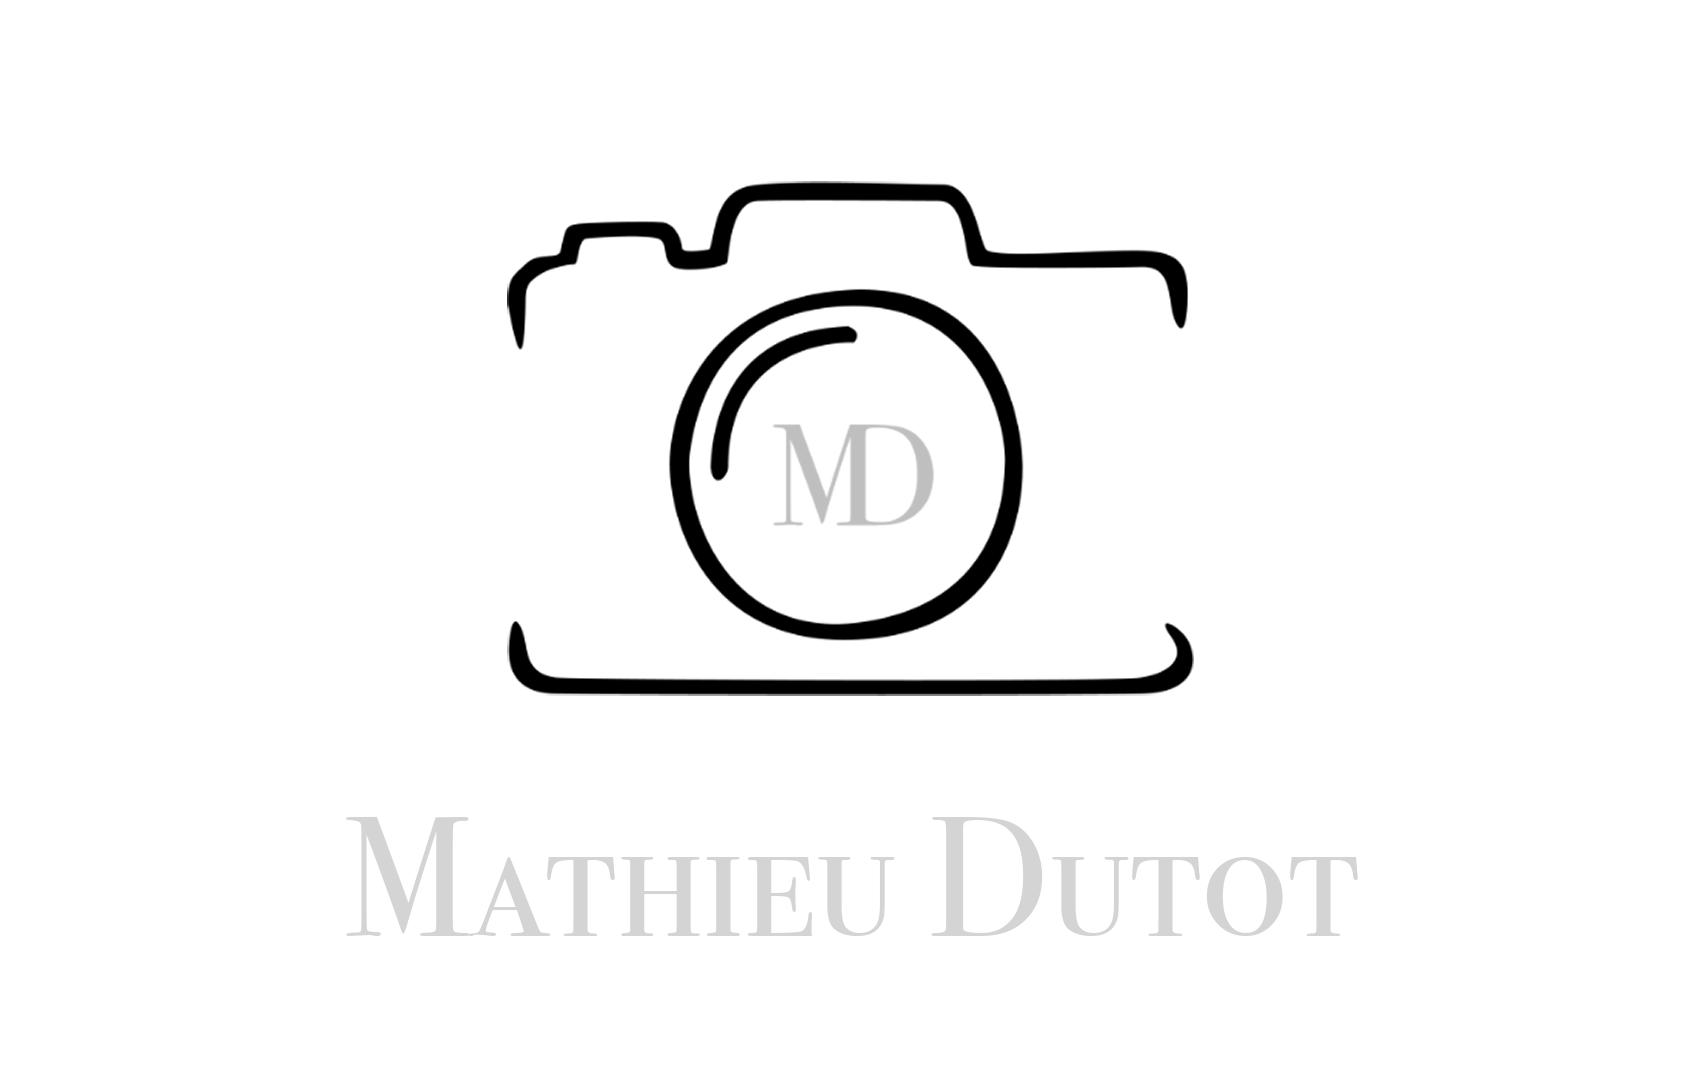 Mathieu Dutot